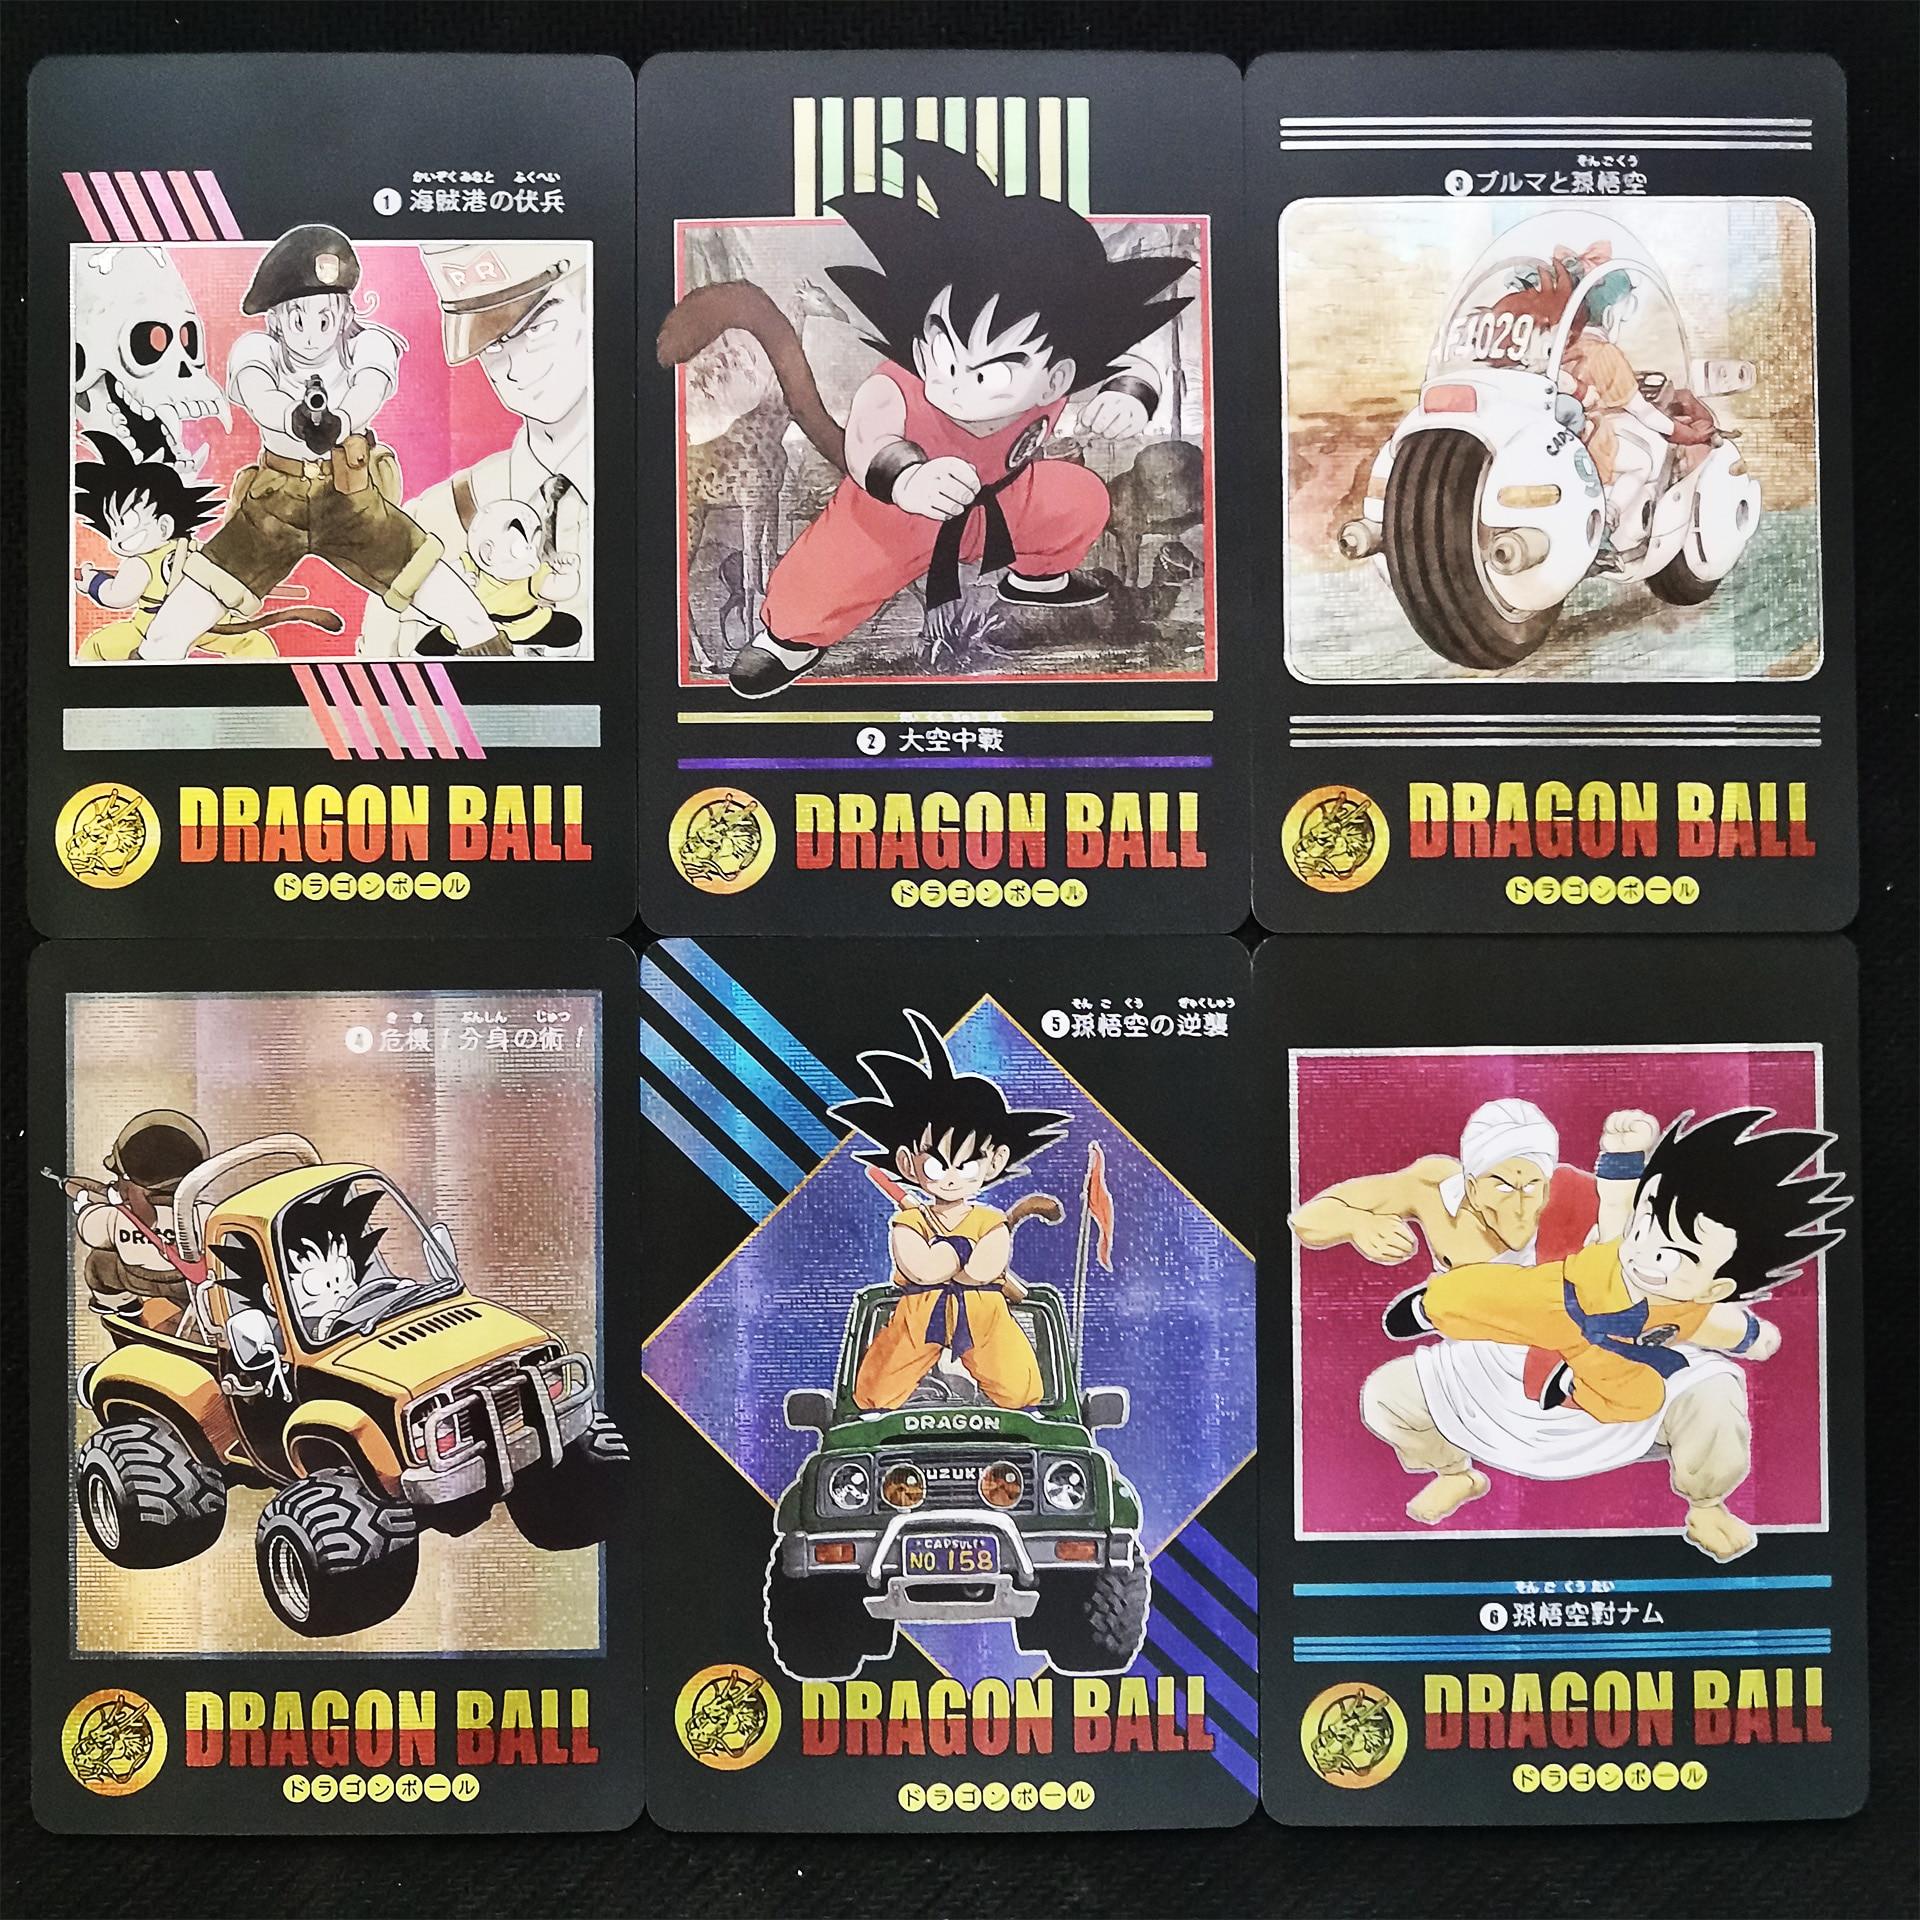 42pcs/set Super Dragon Ball Heroes Battle Card Ultra Instinct Goku Vegeta Dragon Ball Super Game Collection Golden Flash Cards